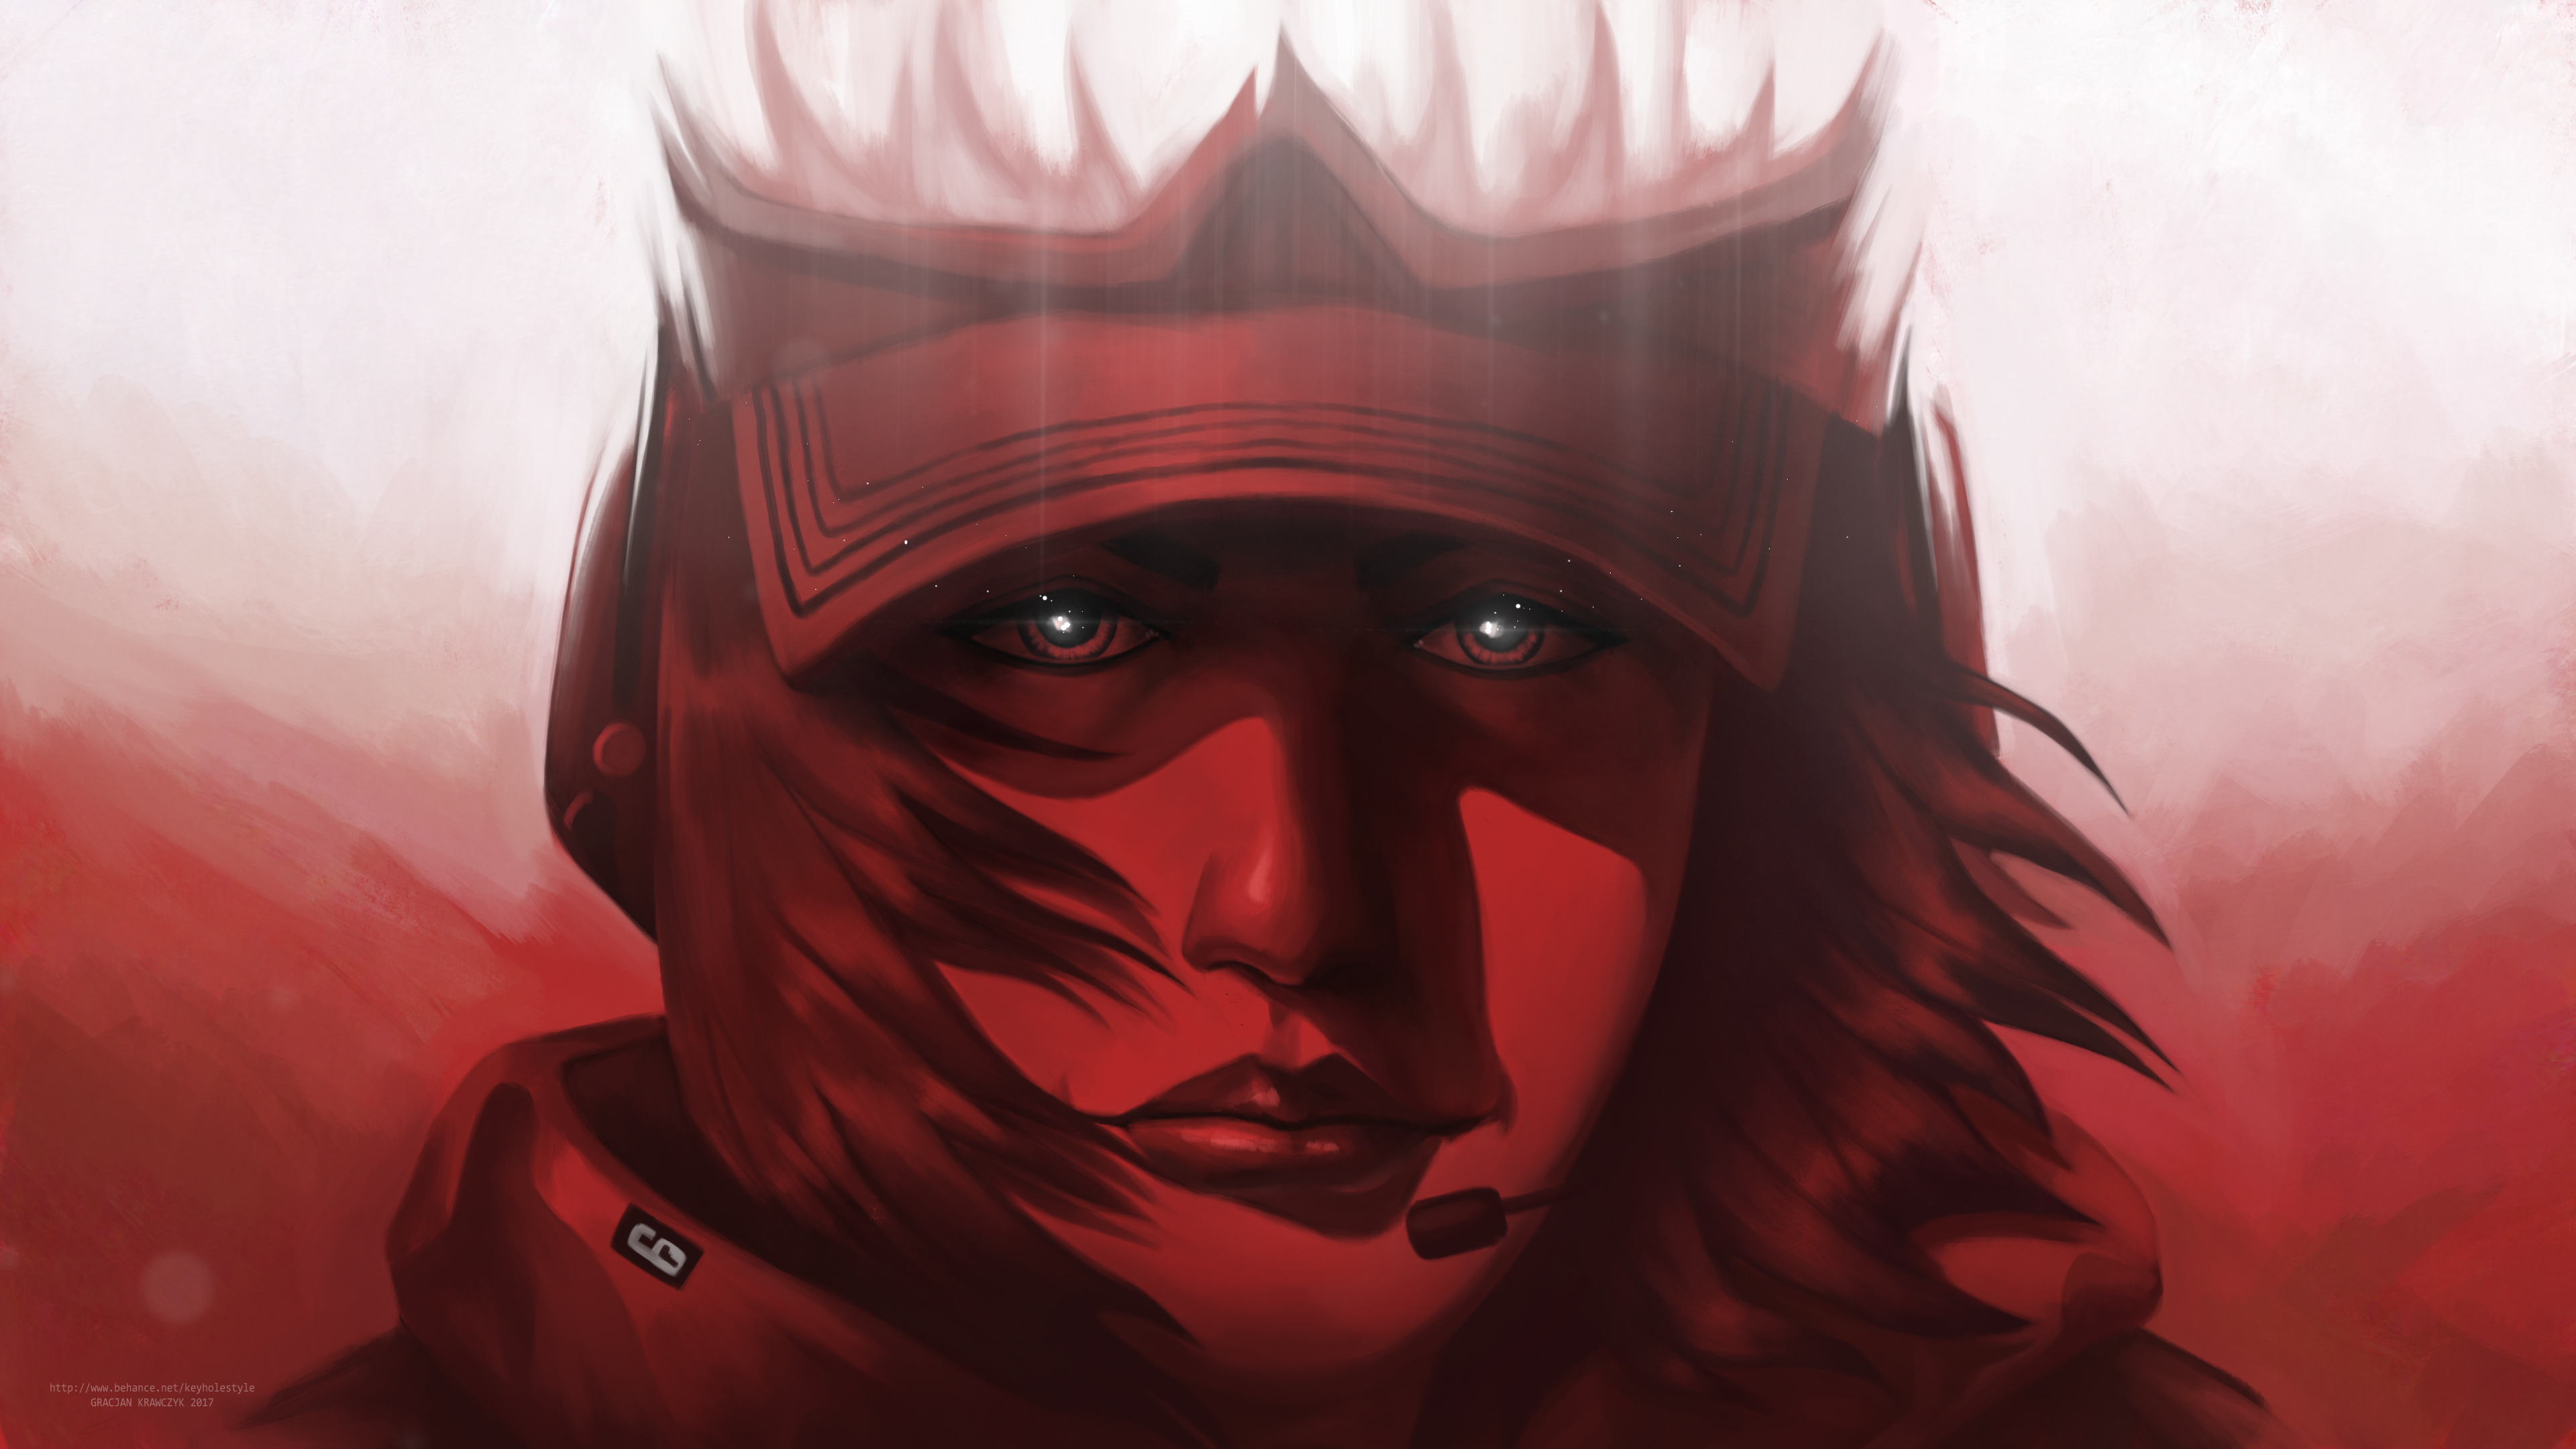 Tom Clancys Rainbow Six Siege Digital Art, HD Games, 4k